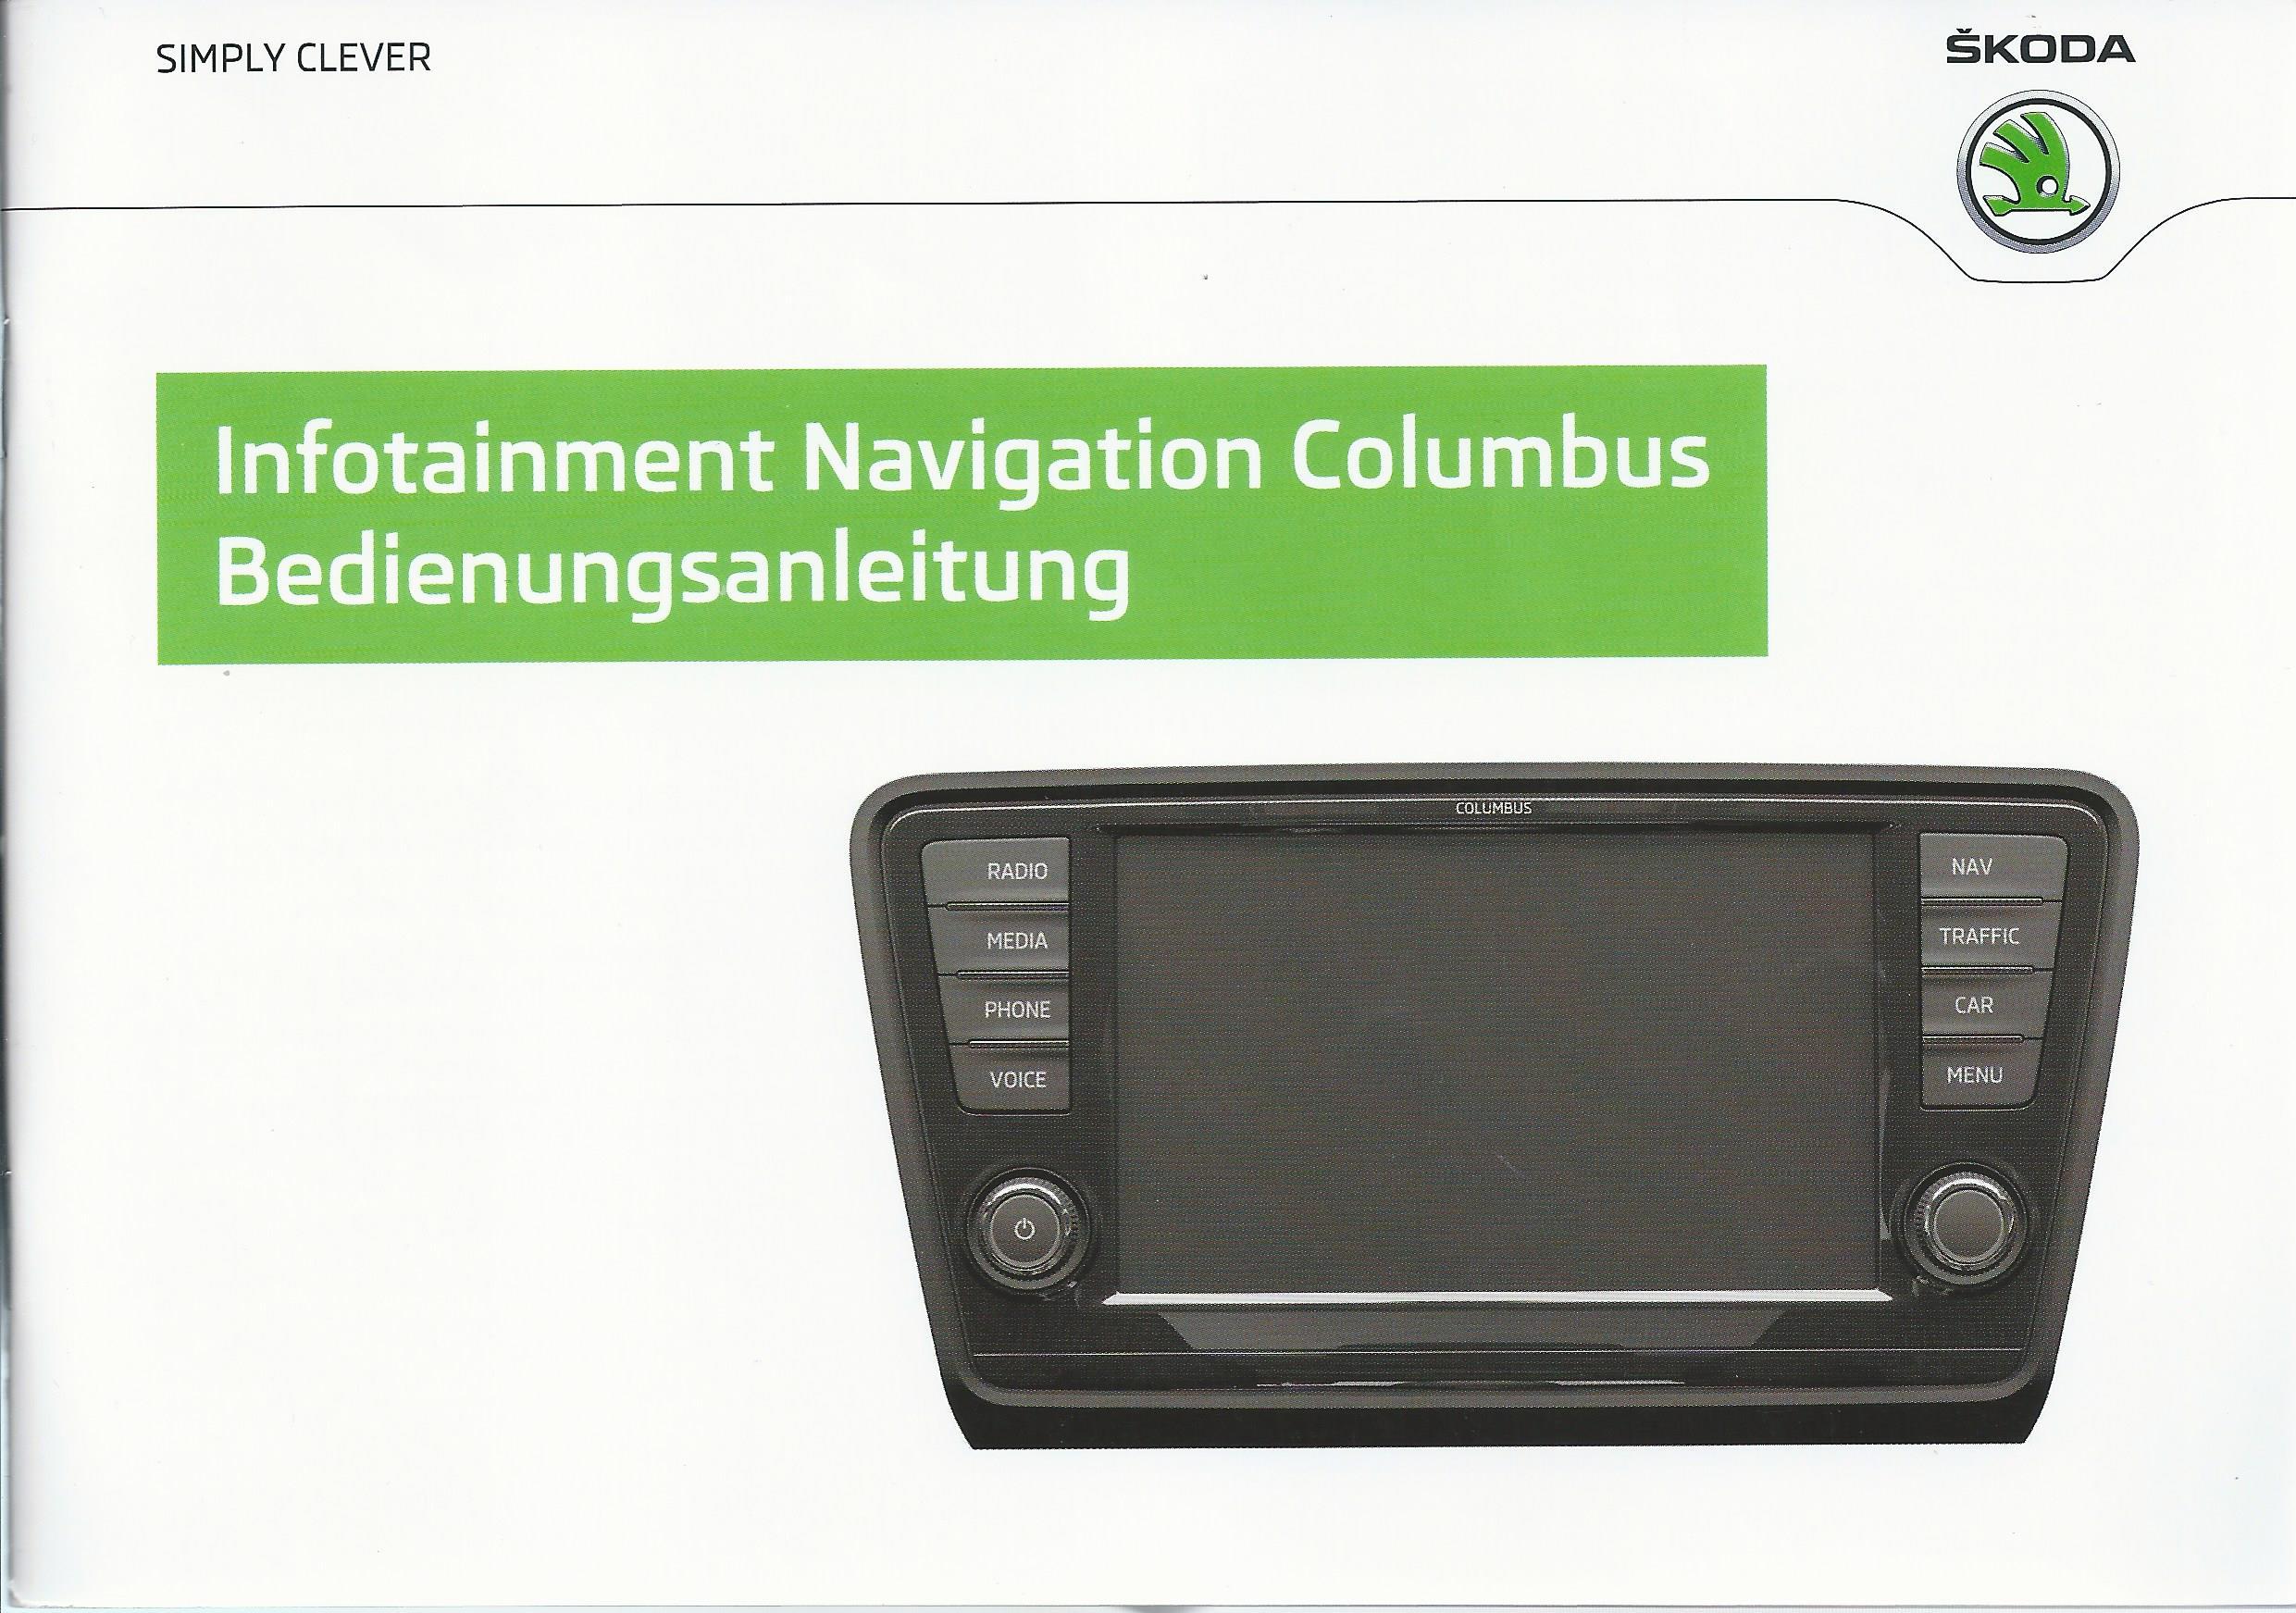 skoda infotainment navigation columbus 2012. Black Bedroom Furniture Sets. Home Design Ideas